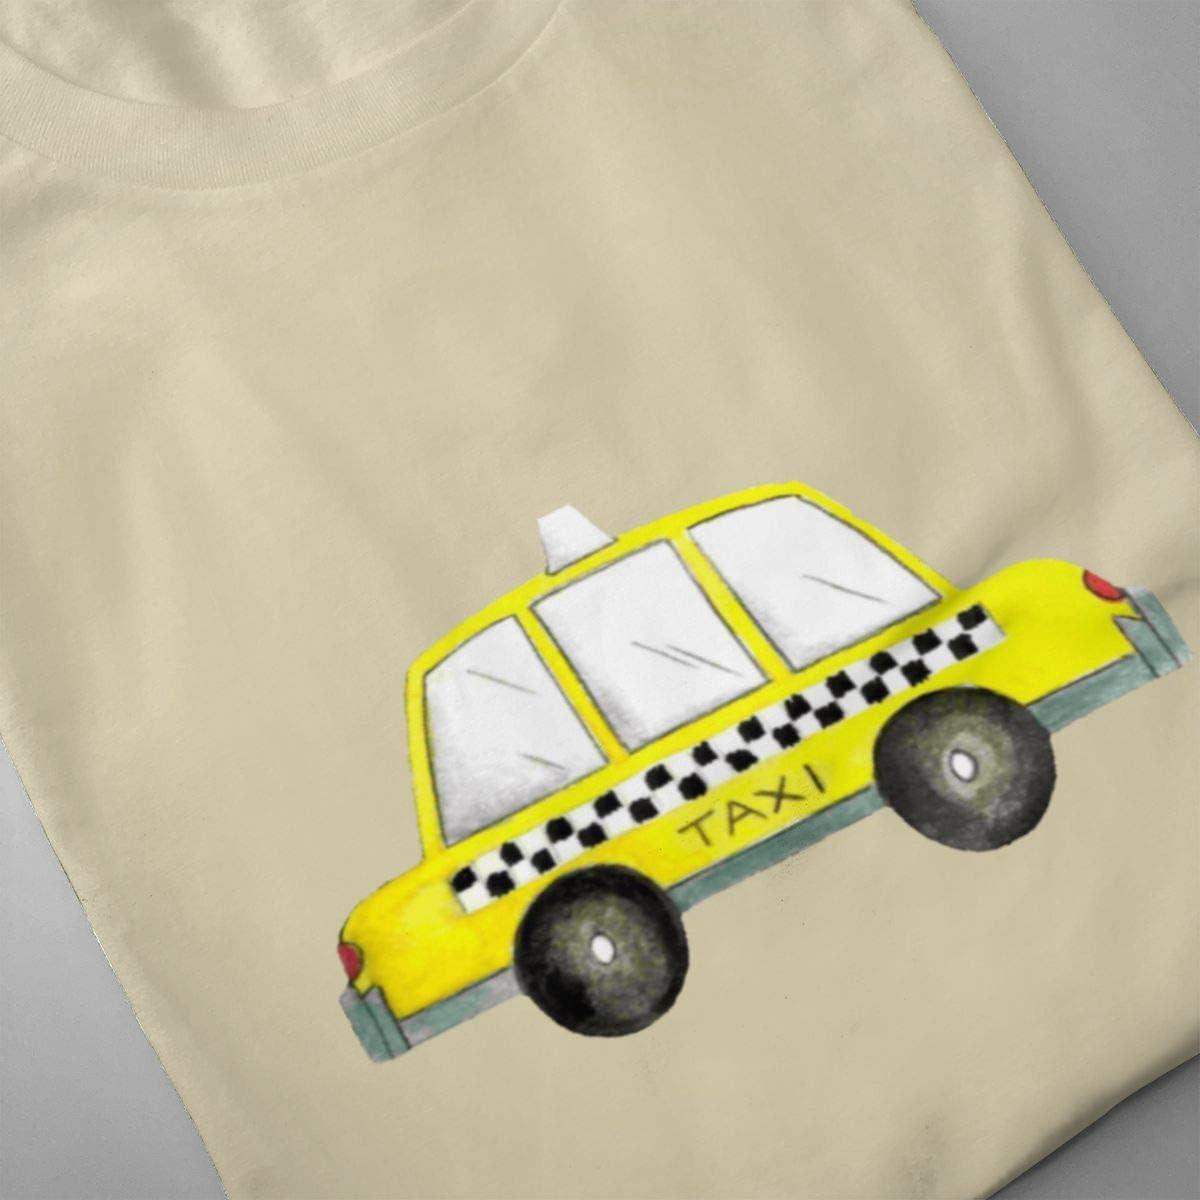 Seuriamin Taxi NYC Yellow New York City Checkered Cab Car Mens Fashion Athletic Short Sleeve Tee